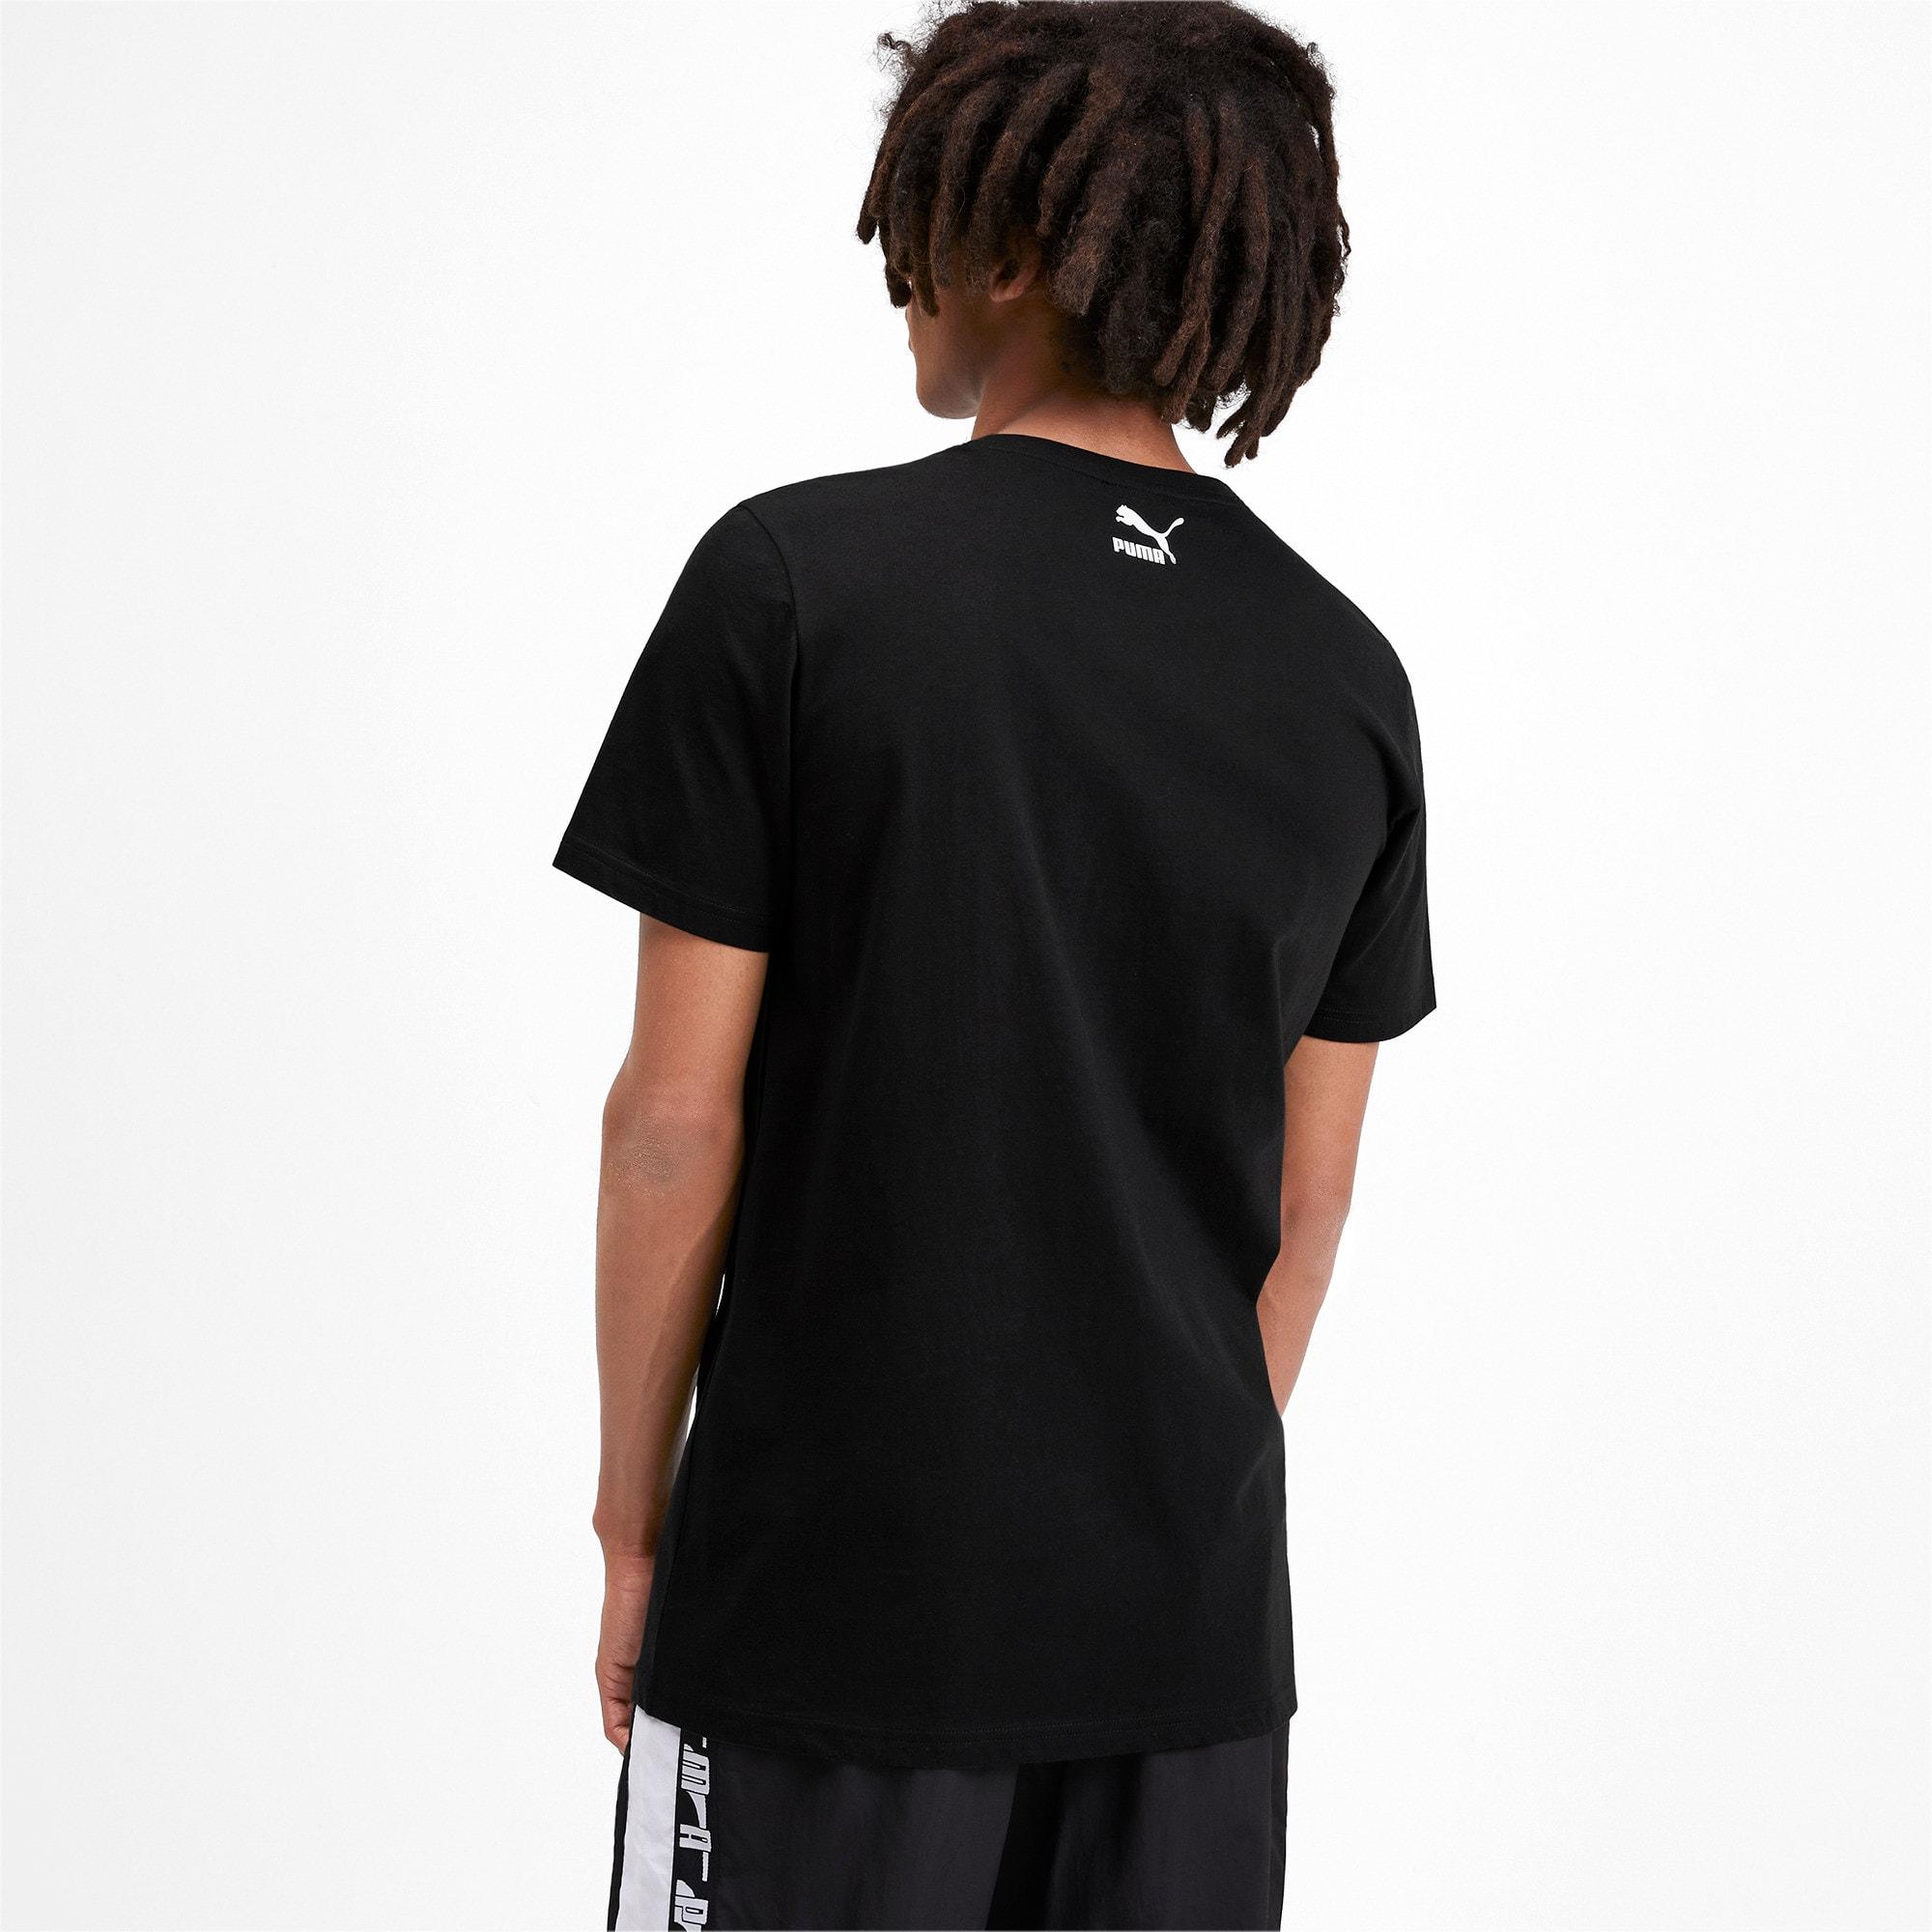 Thumbnail 2 of PUMA XTG グラフィック SS Tシャツ, Puma Black, medium-JPN